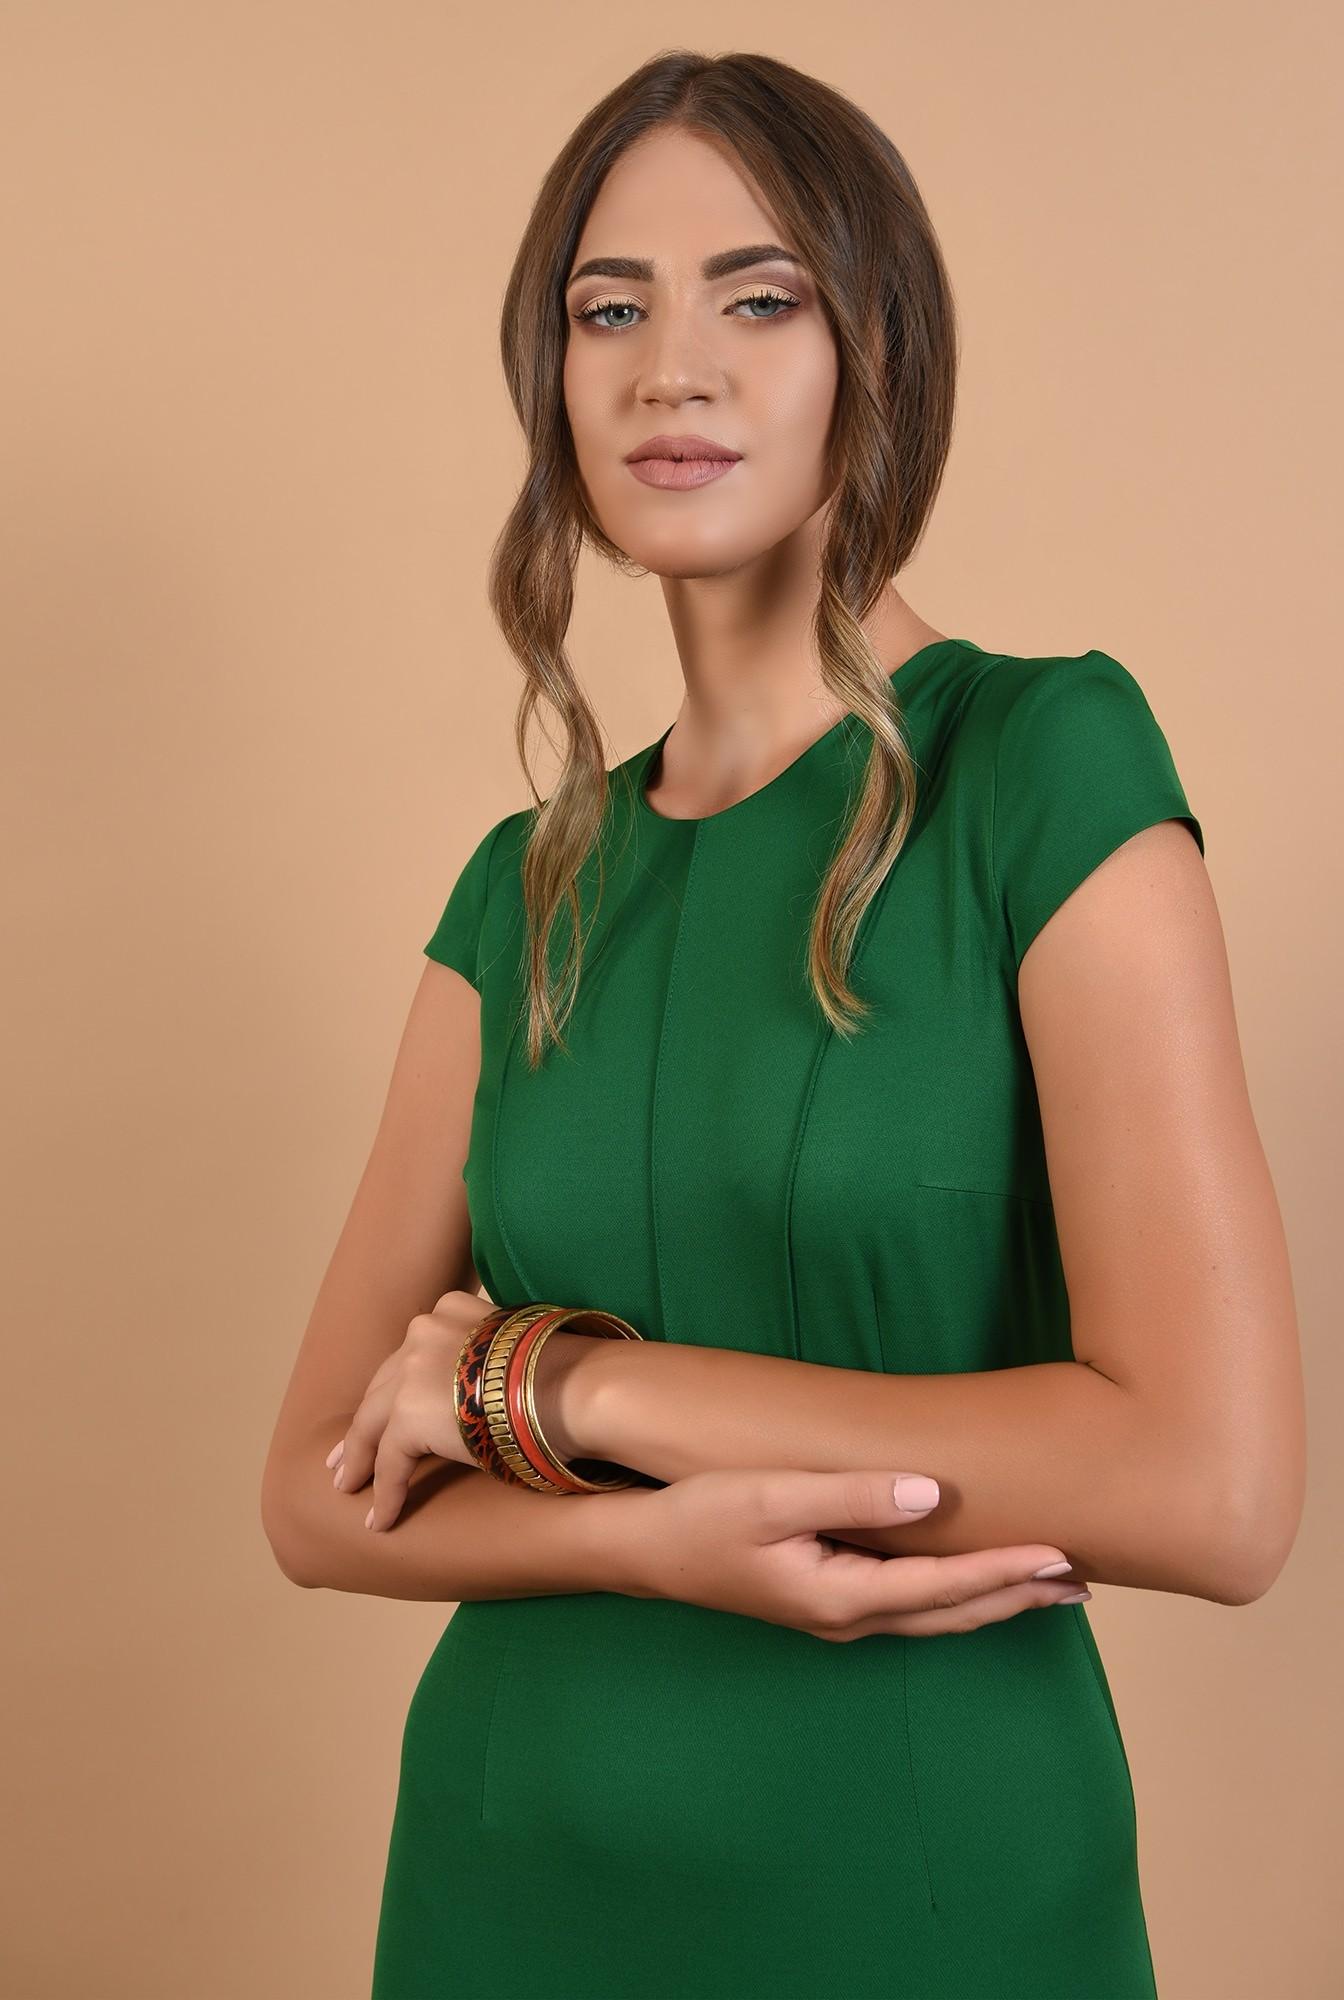 2 - rochie verde, office, conica, midi, cu maneci capac, cusaturi decorative, Poema